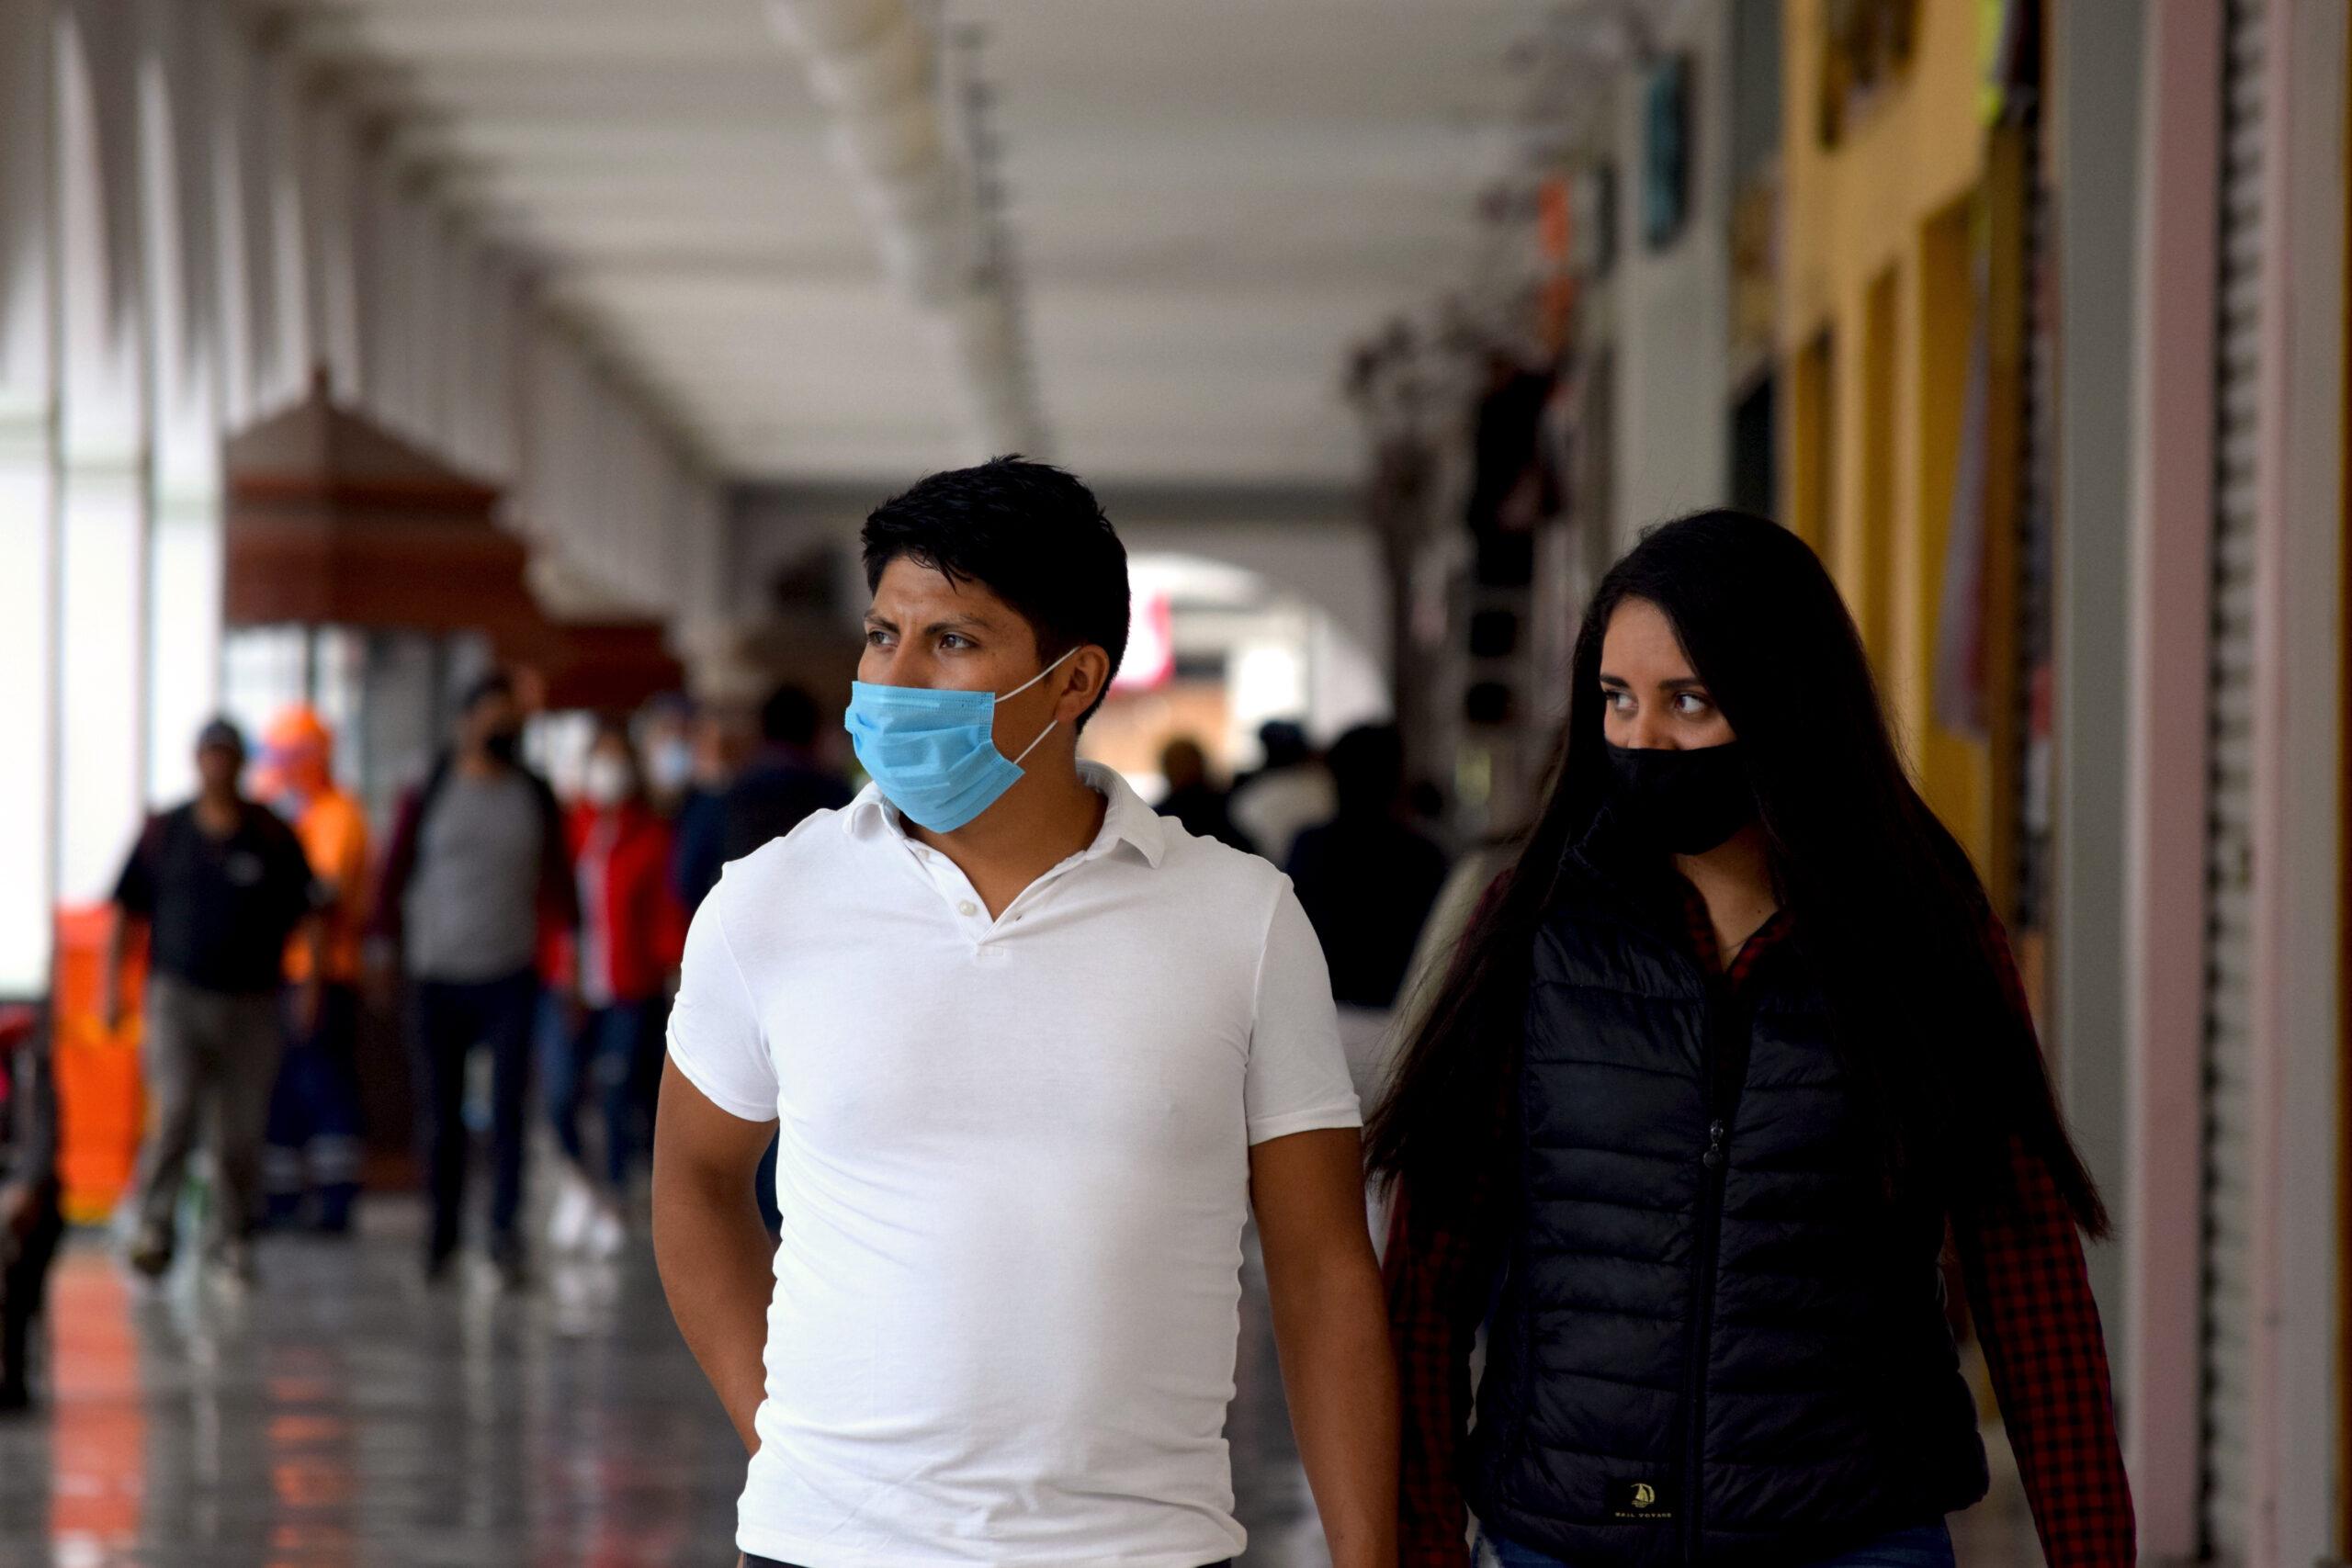 Continúan en Toluca medidas sanitarias para avanzar en el semáforo epodemiológico